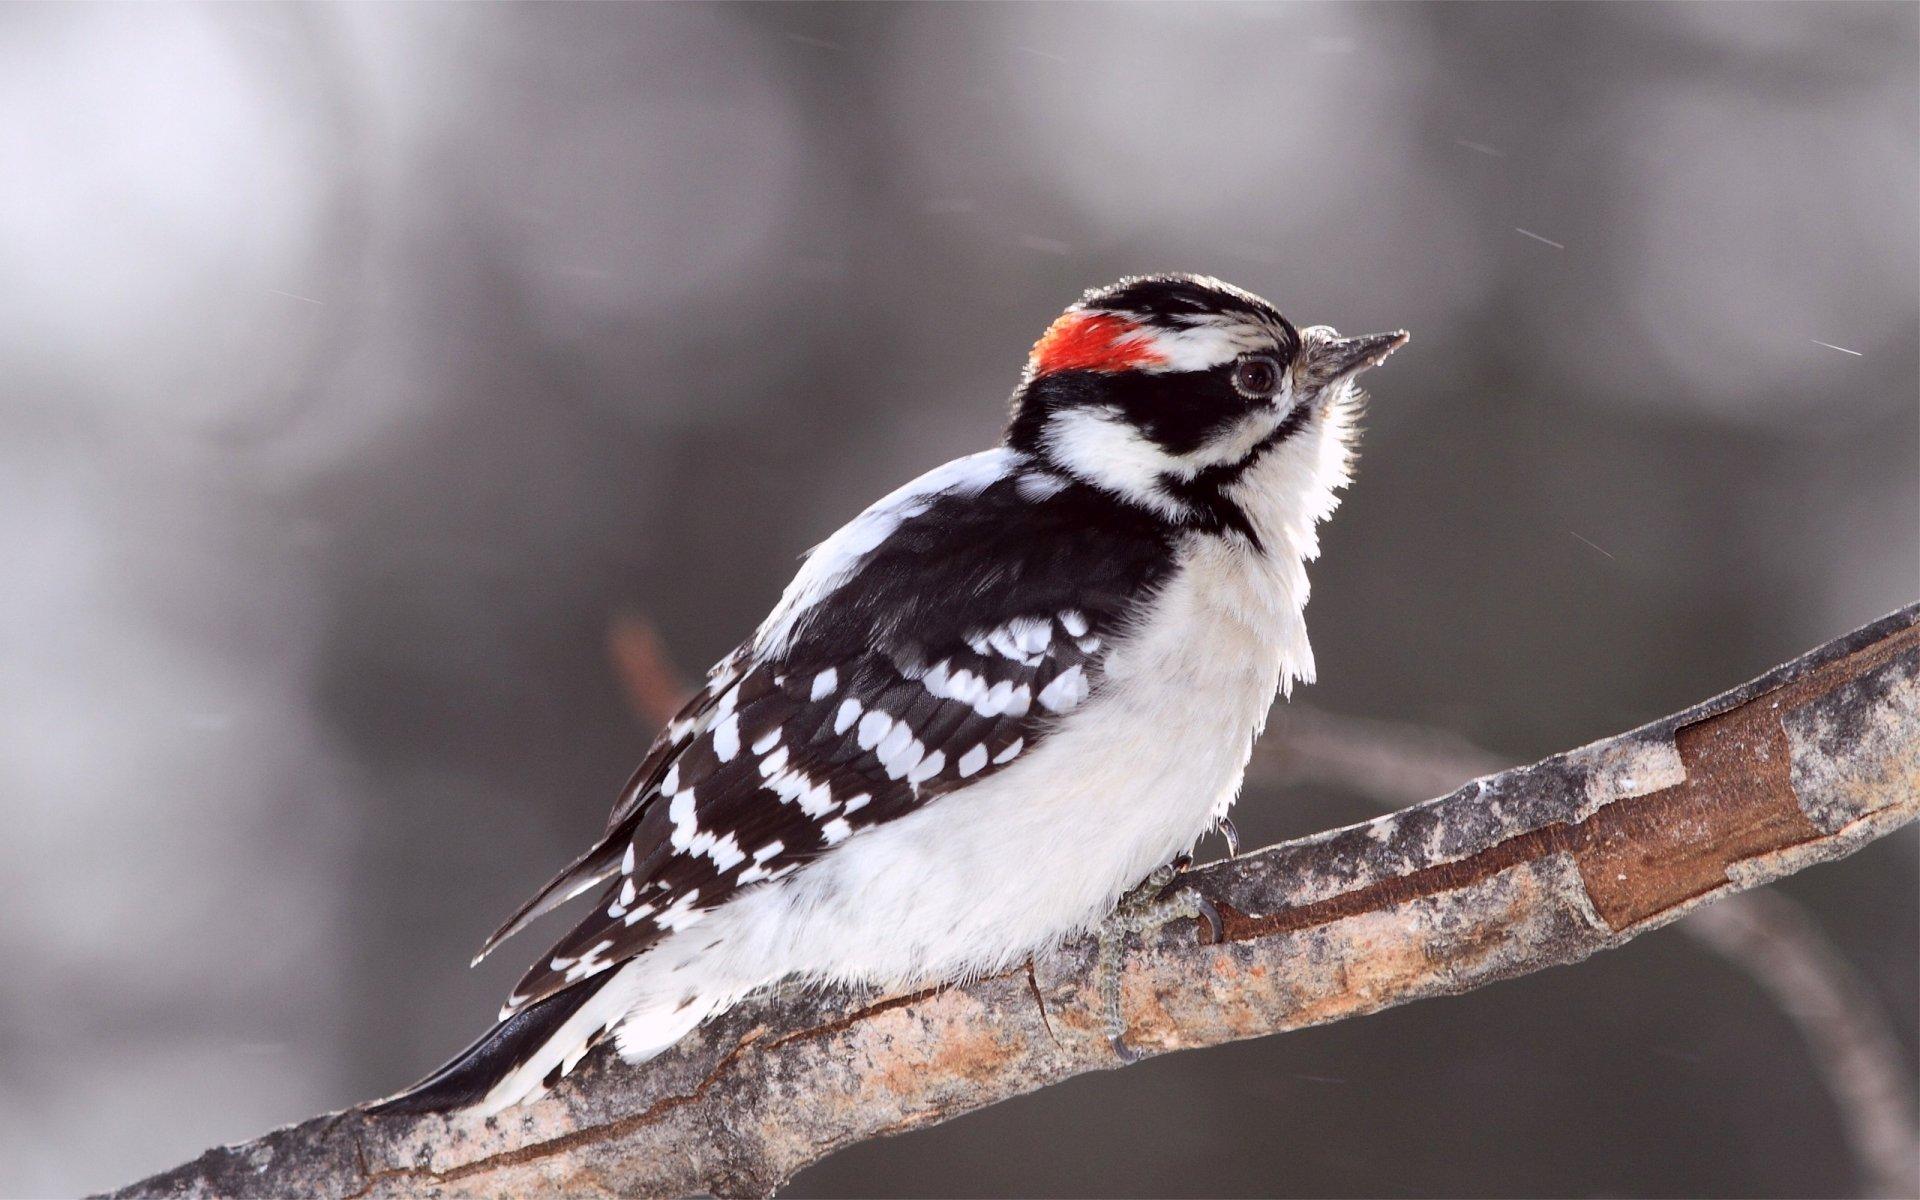 Colorful Woodpecker Wallpaper 30228